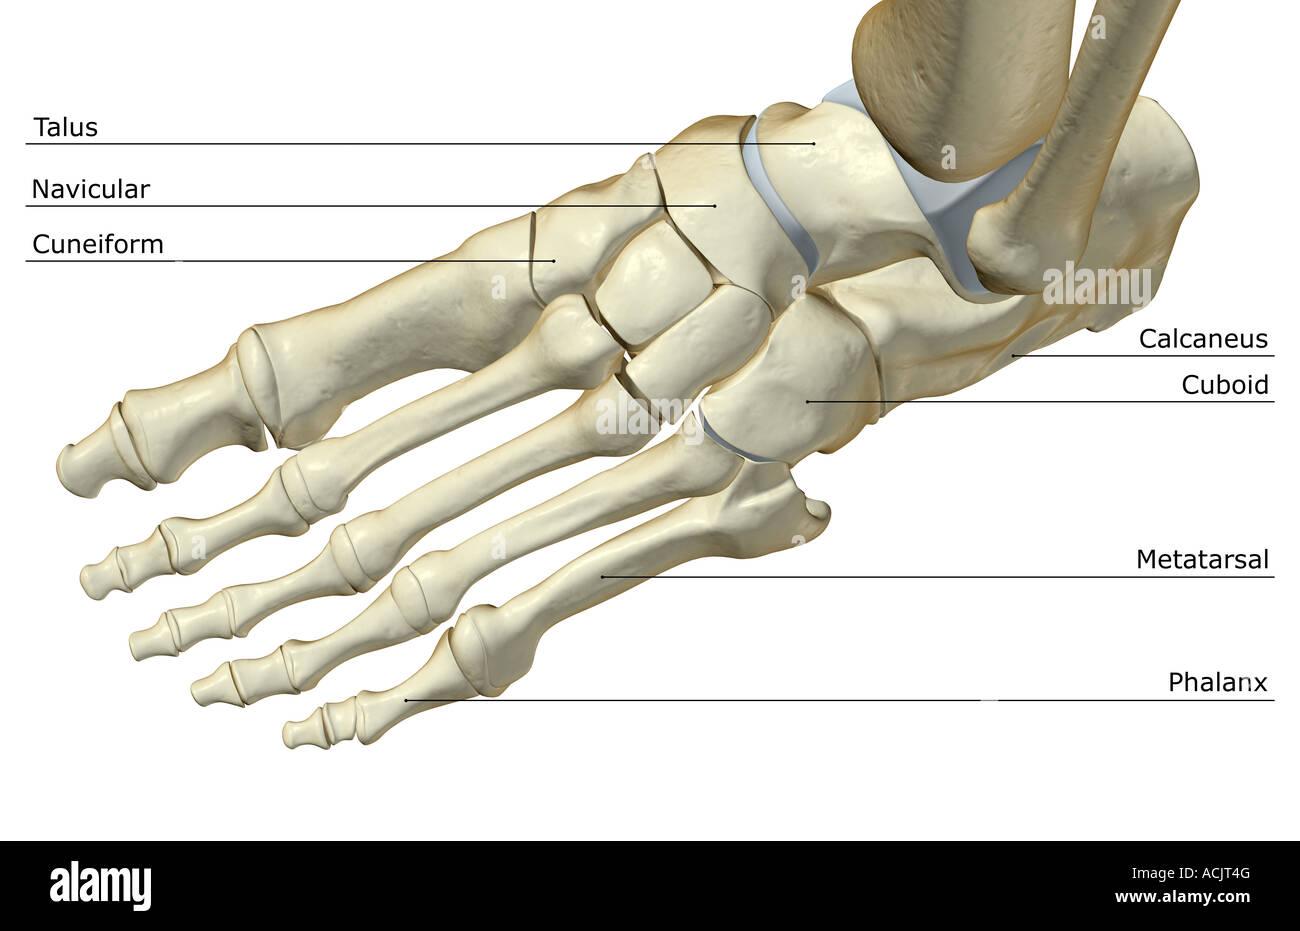 The Bones Of The Foot Stock Photo Alamy